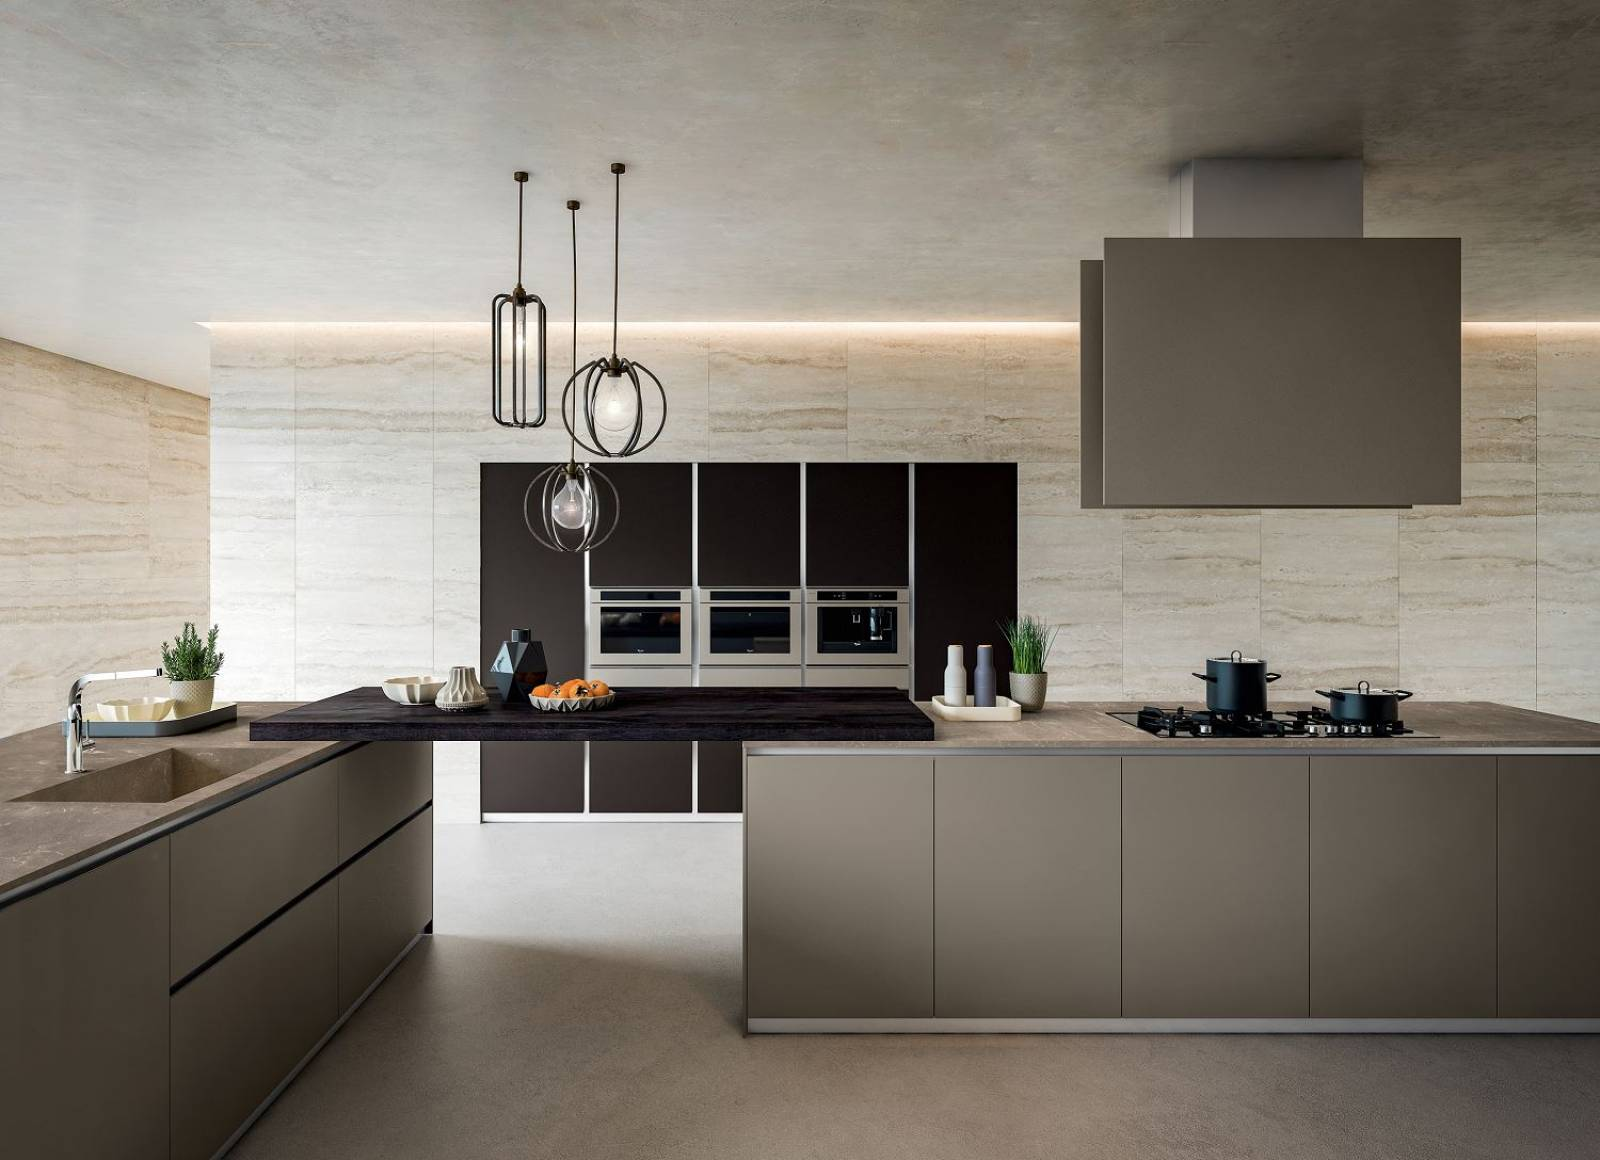 Cuisine moderne pur e laqu e blanc design cuisines for Cuisine moderne laquee